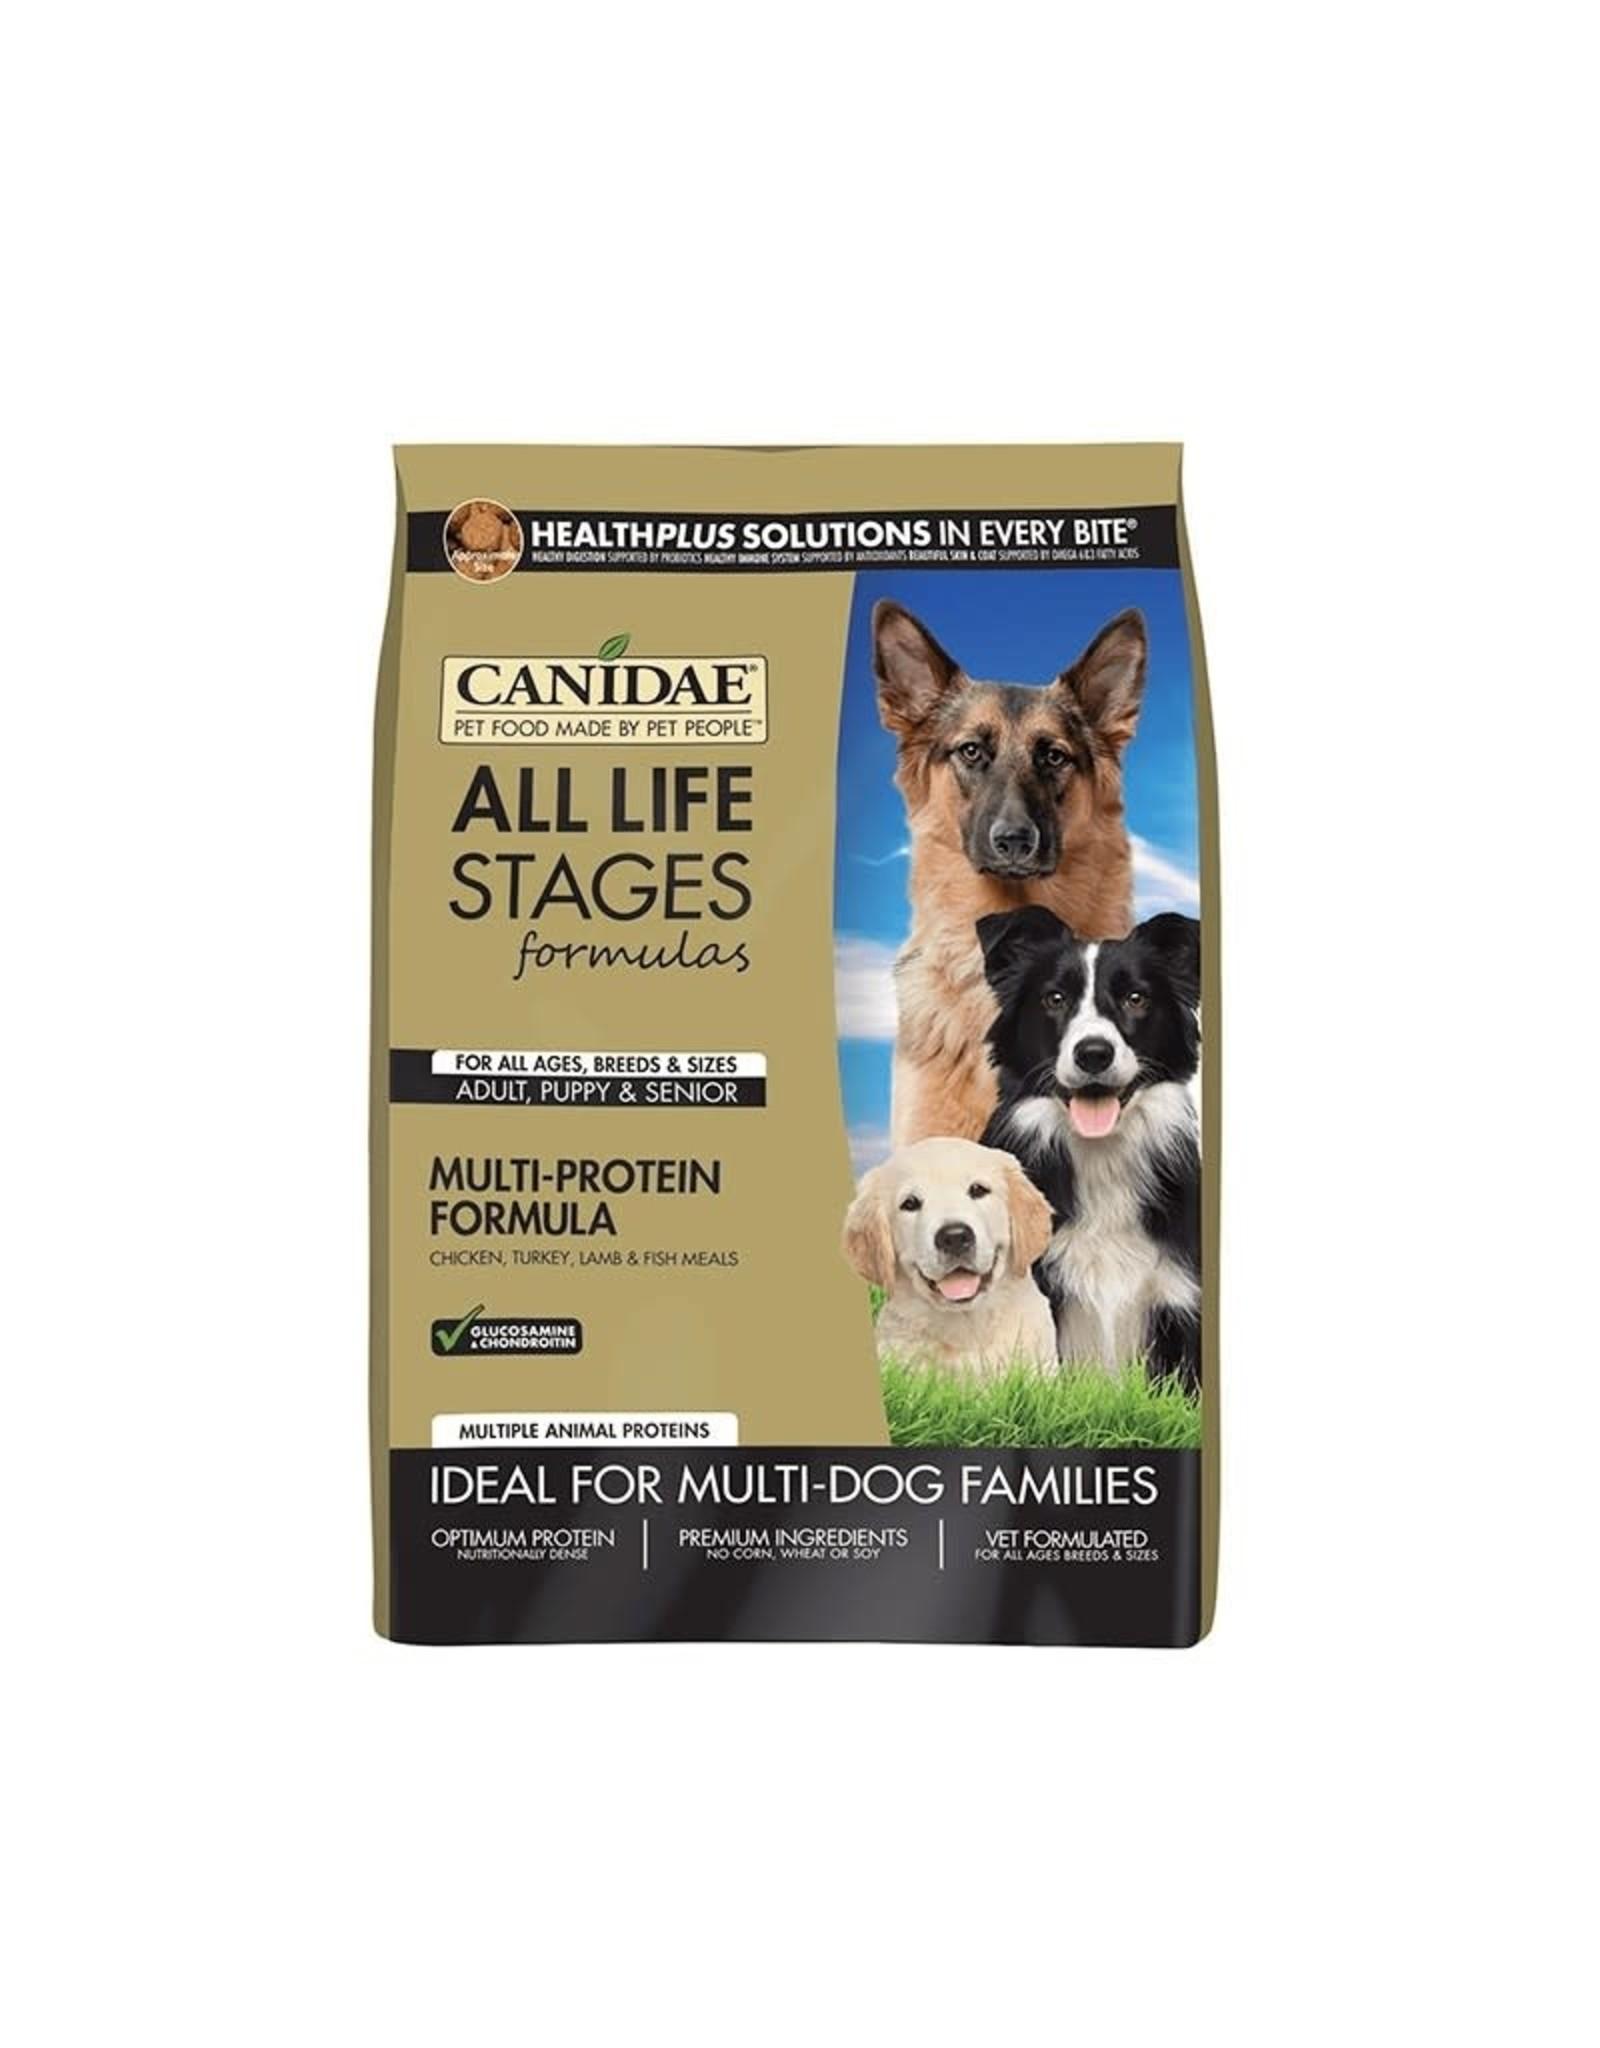 Canidae CANIDAE Multi-Protien ALS 15#